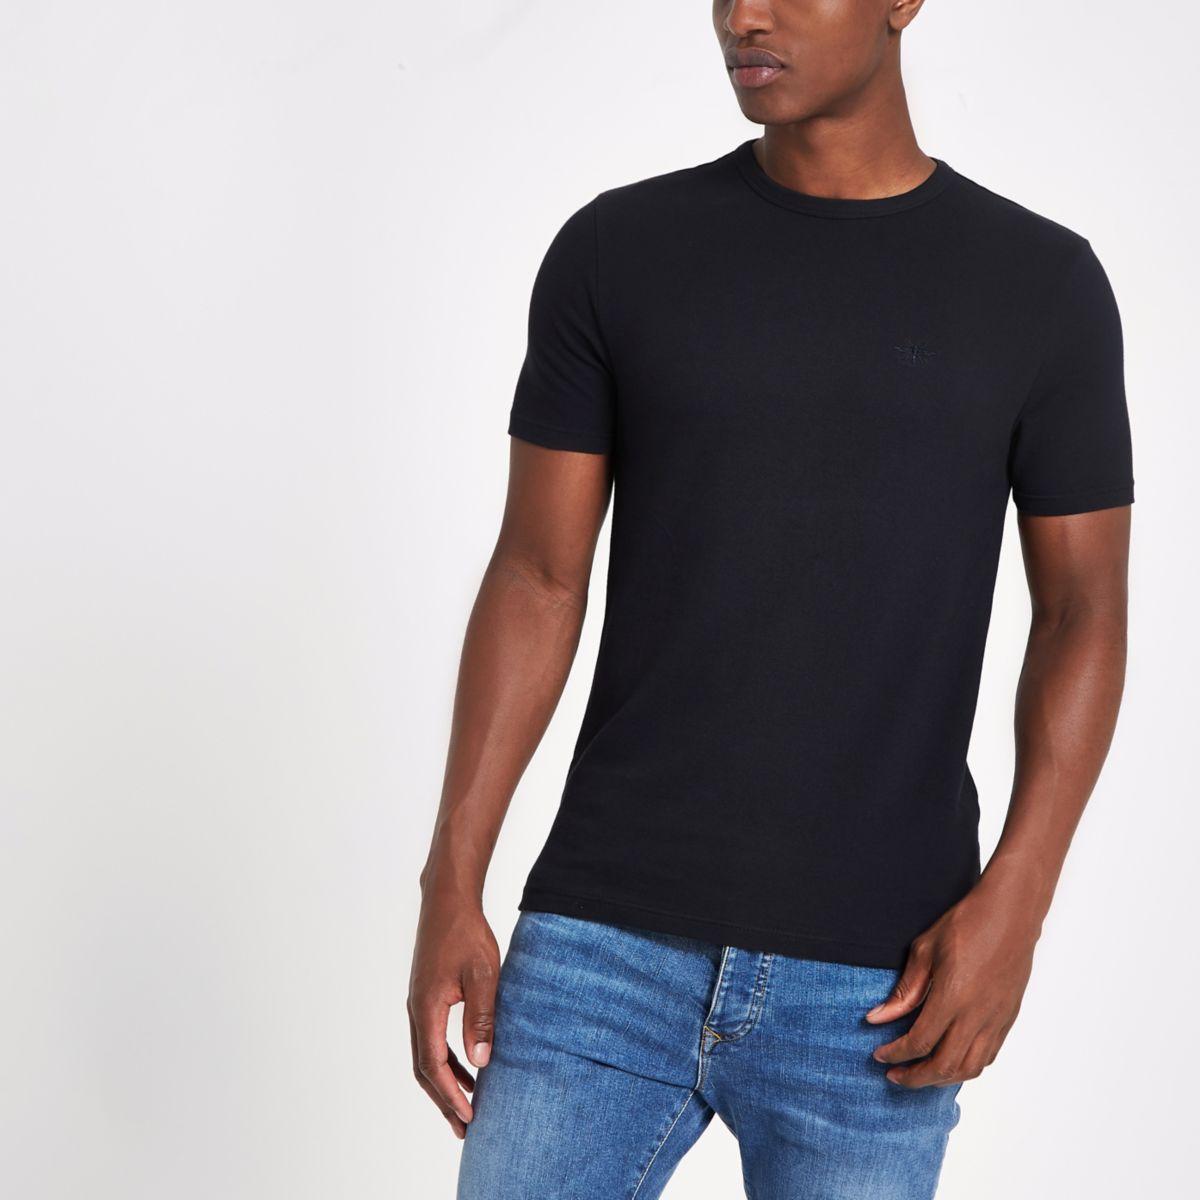 Navy muscle fit crew neck pique T-shirt